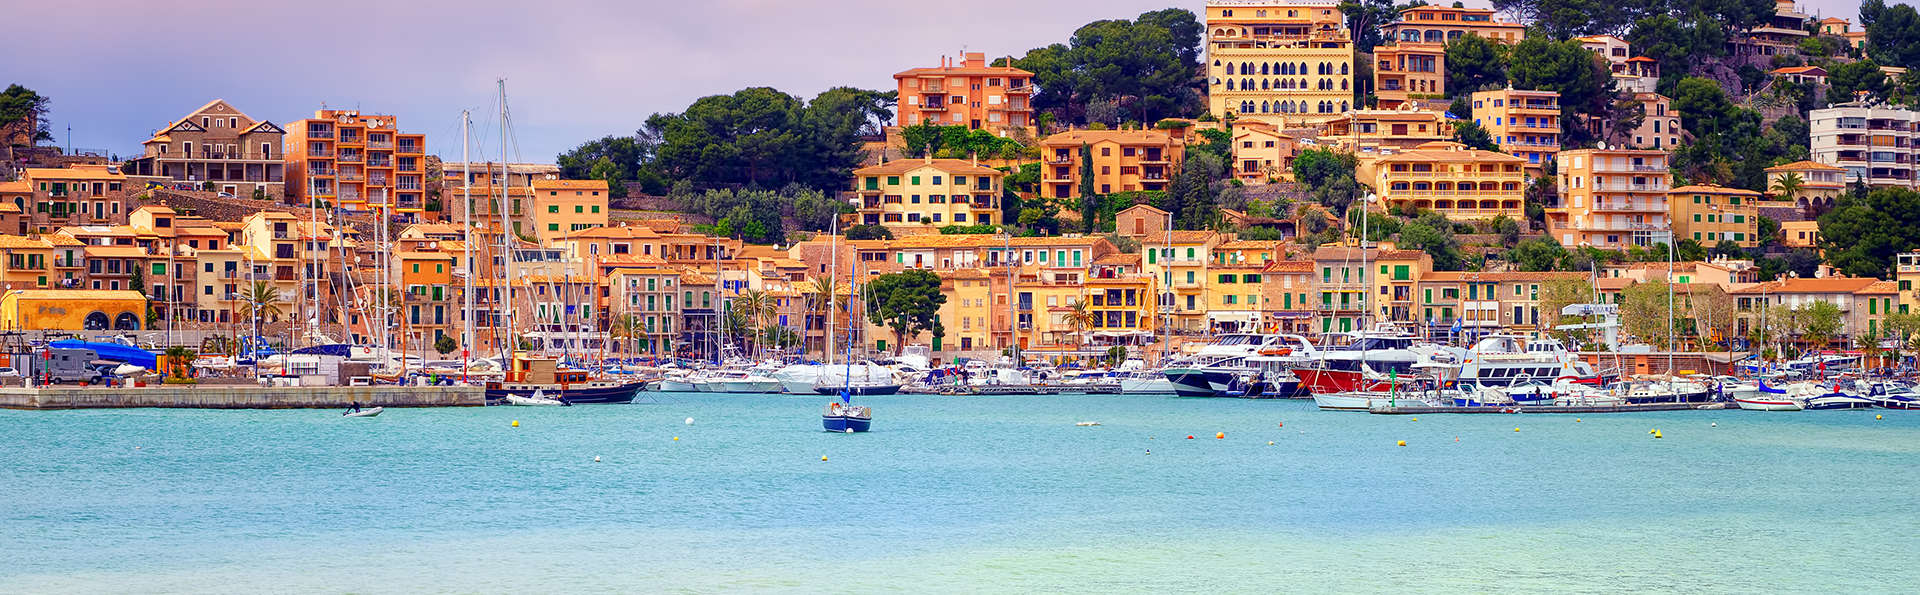 HM Balanguera - Edit_Mallorca2.jpg